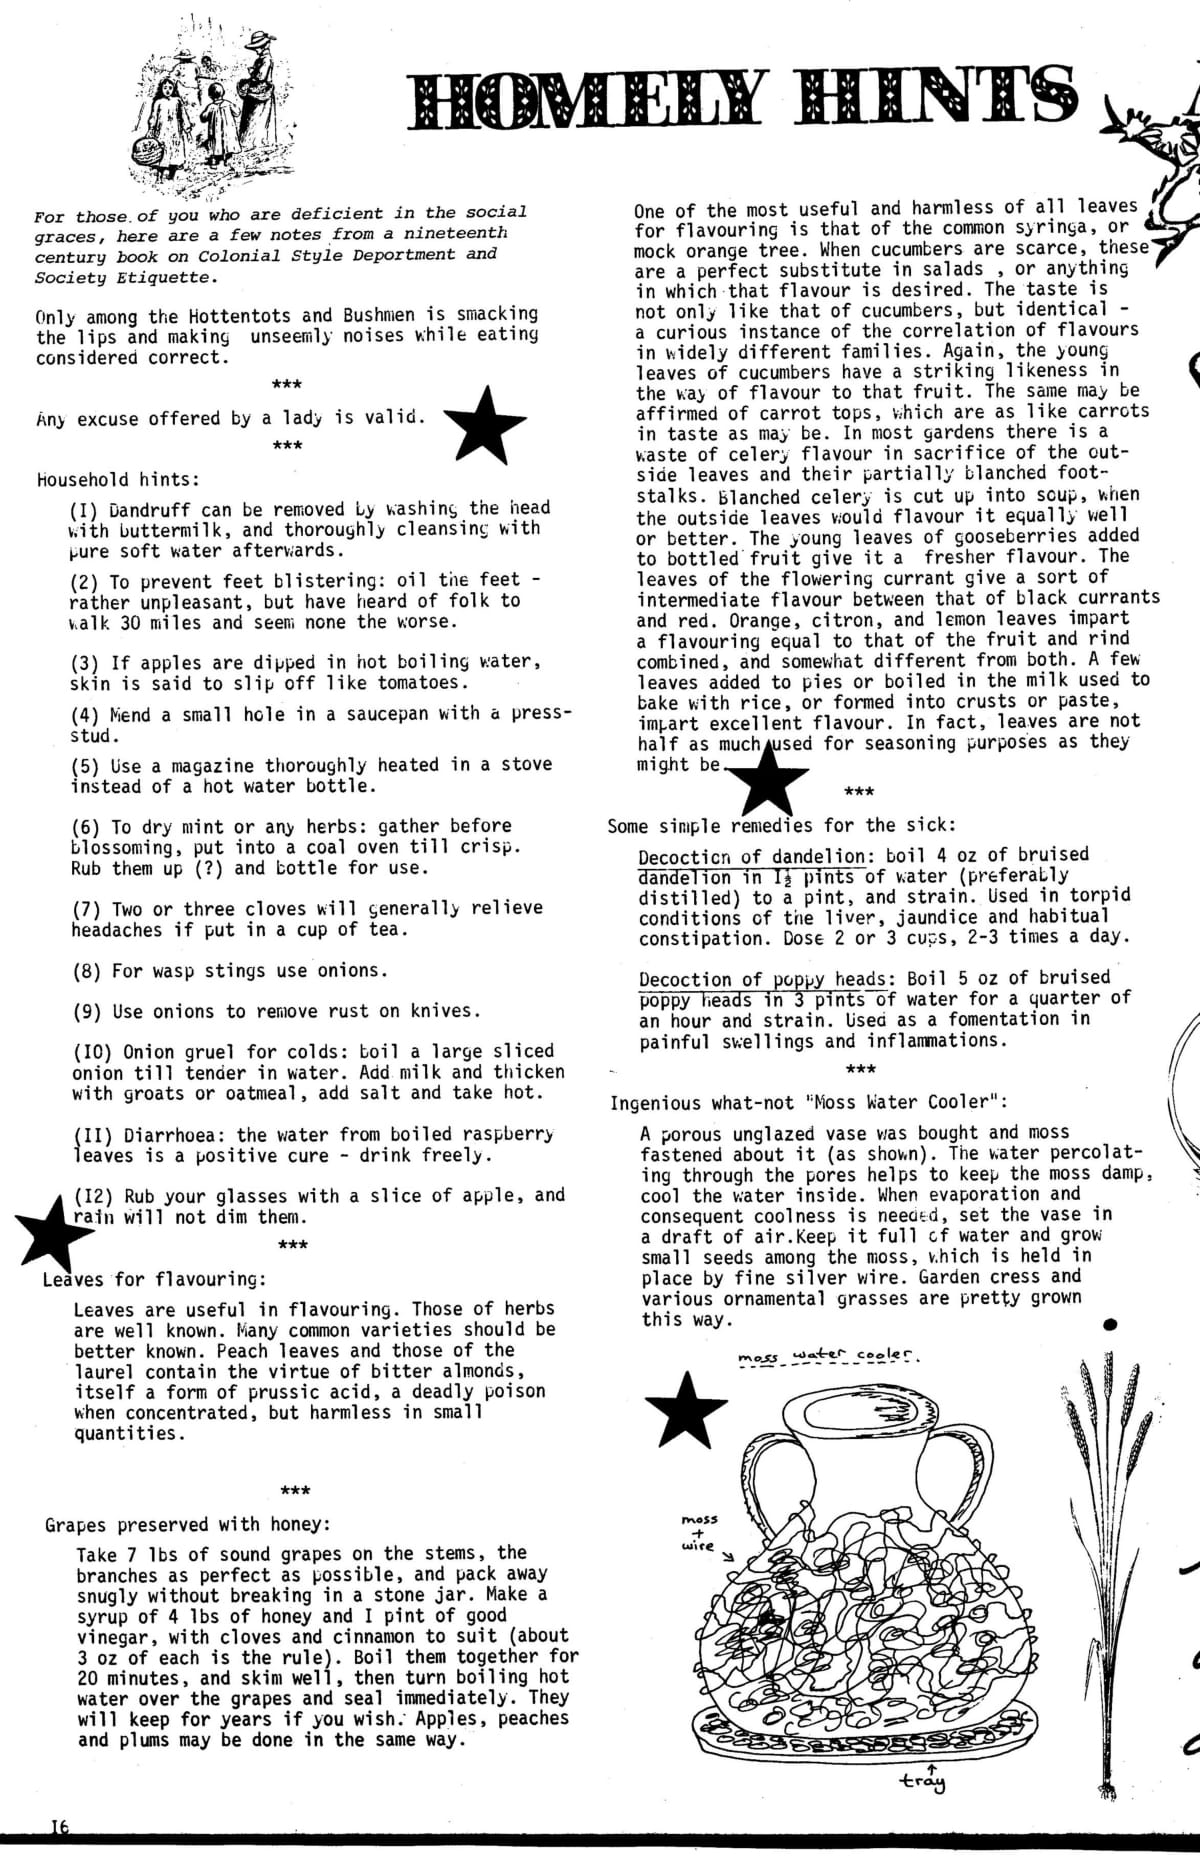 seed-v3-n1-jan1974-16.jpg